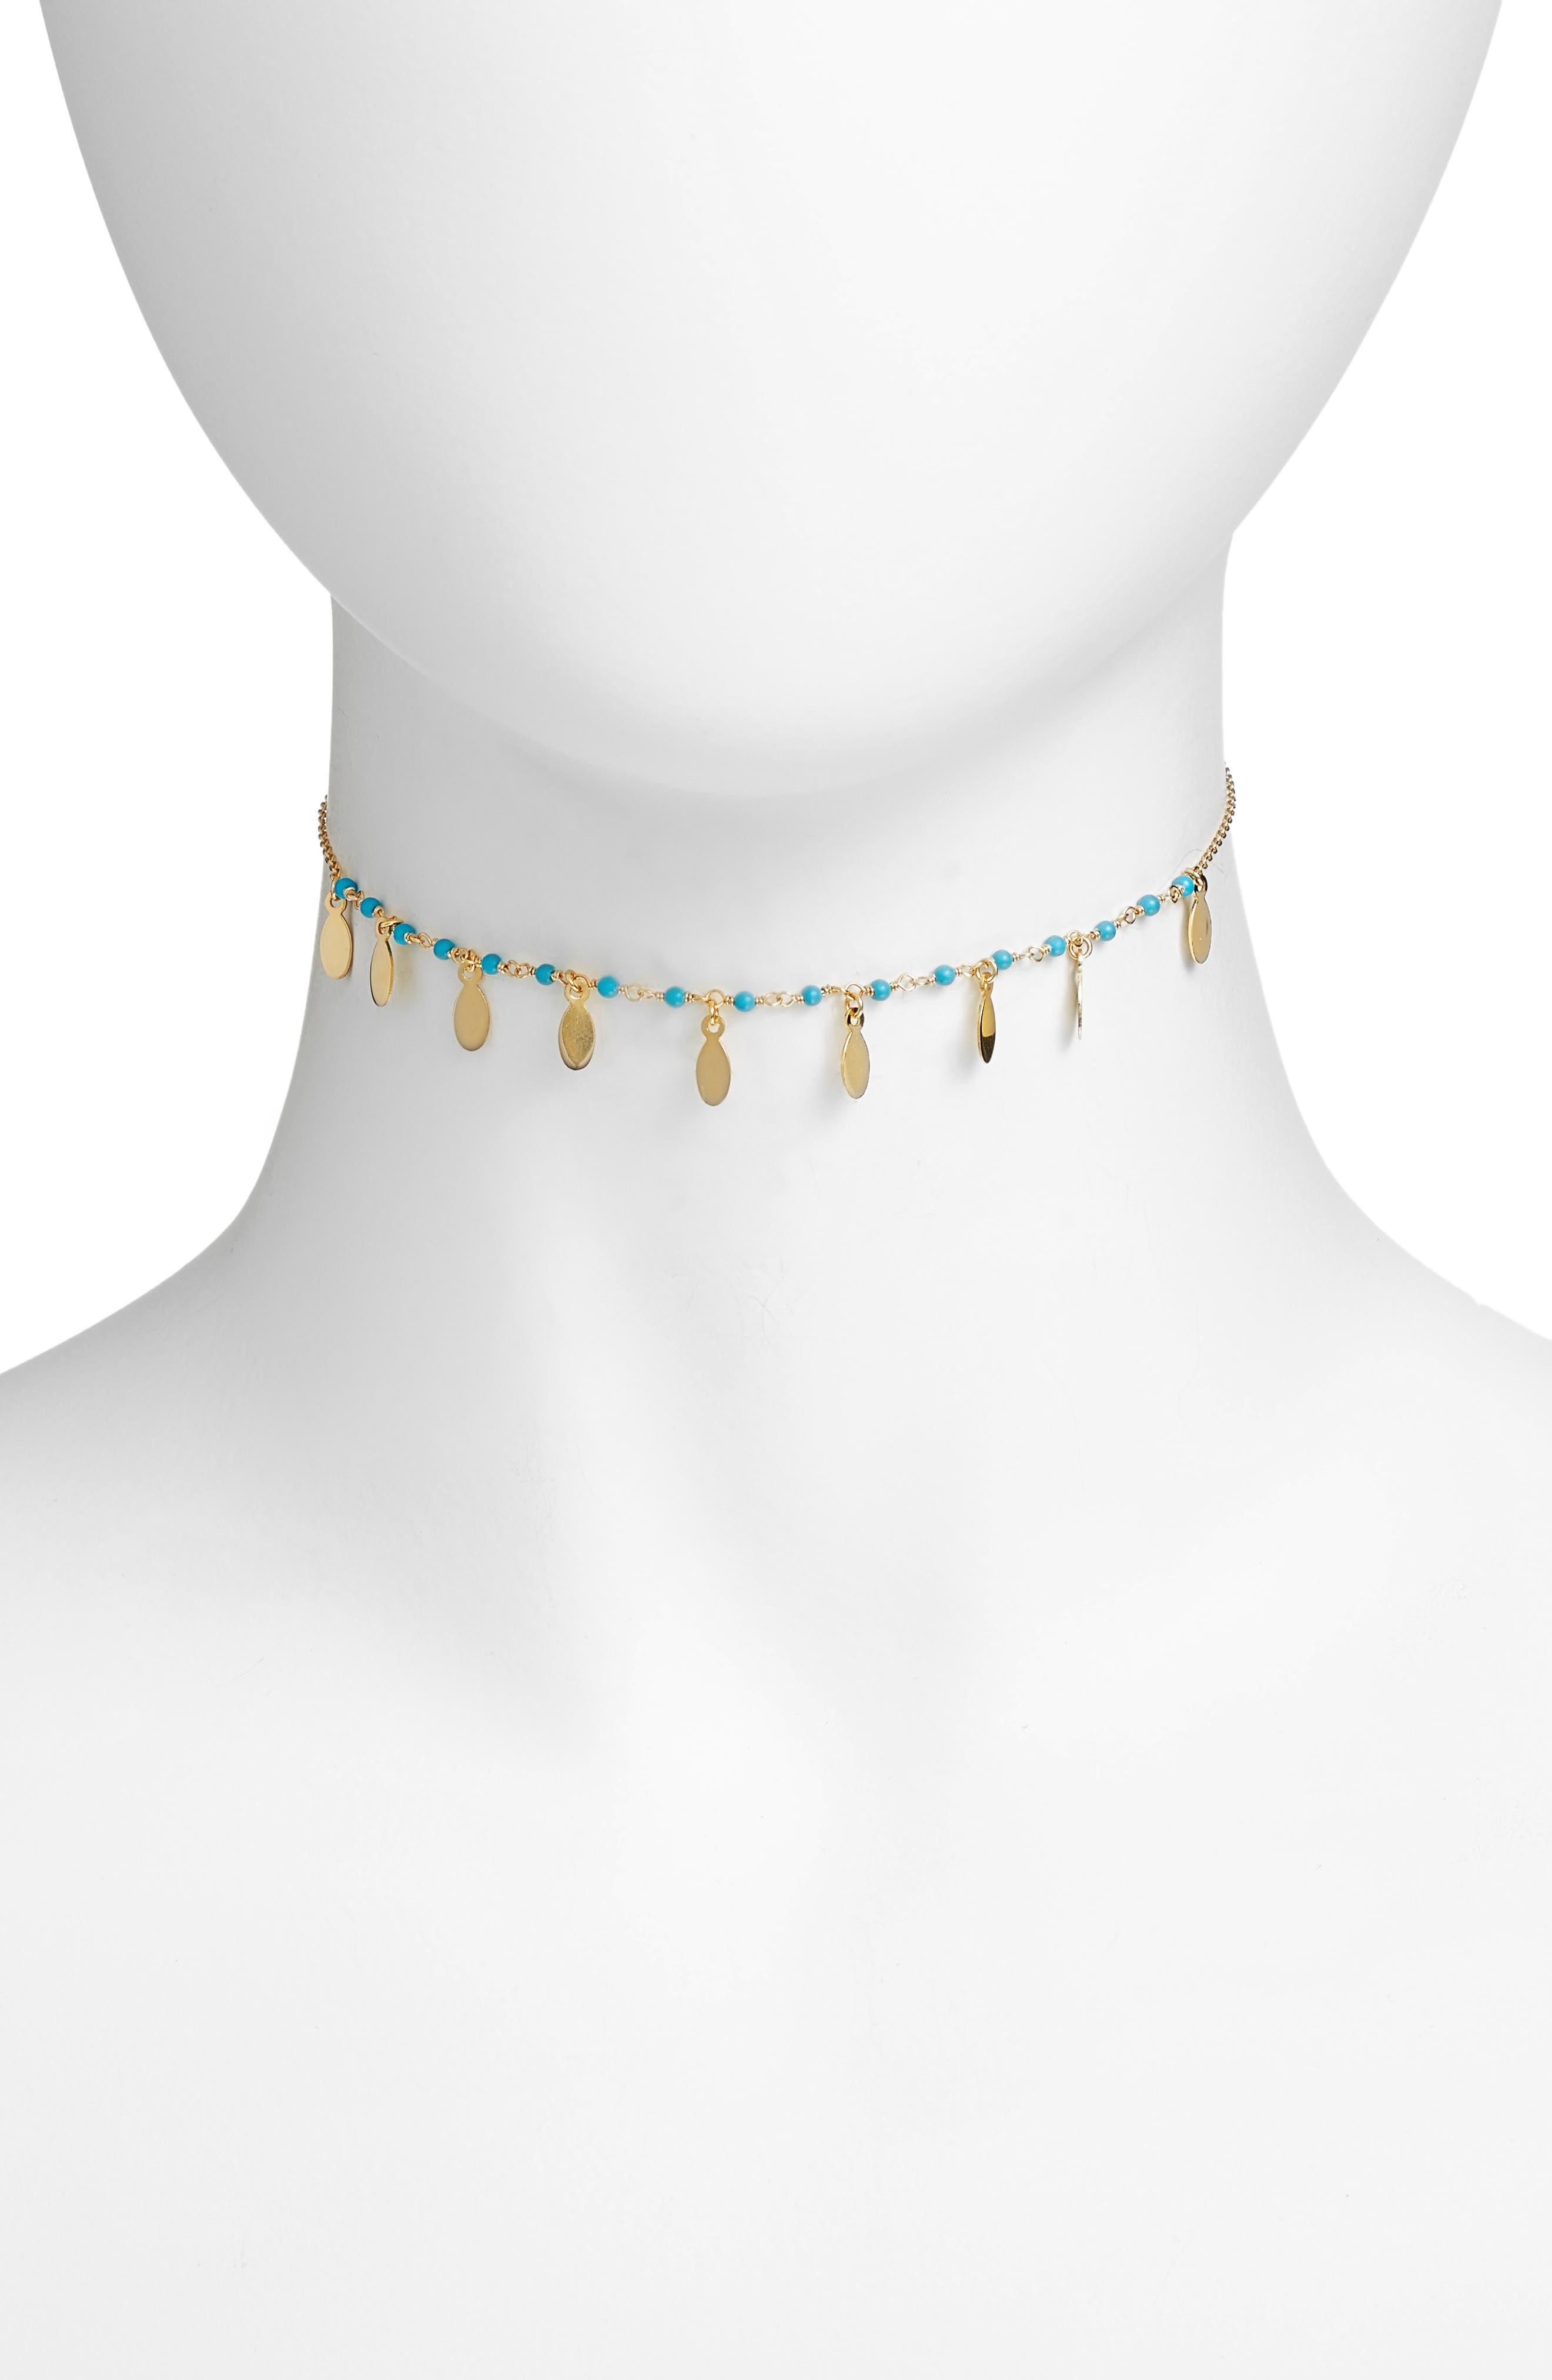 Main Image - Argento Vivo Link Choker Necklace